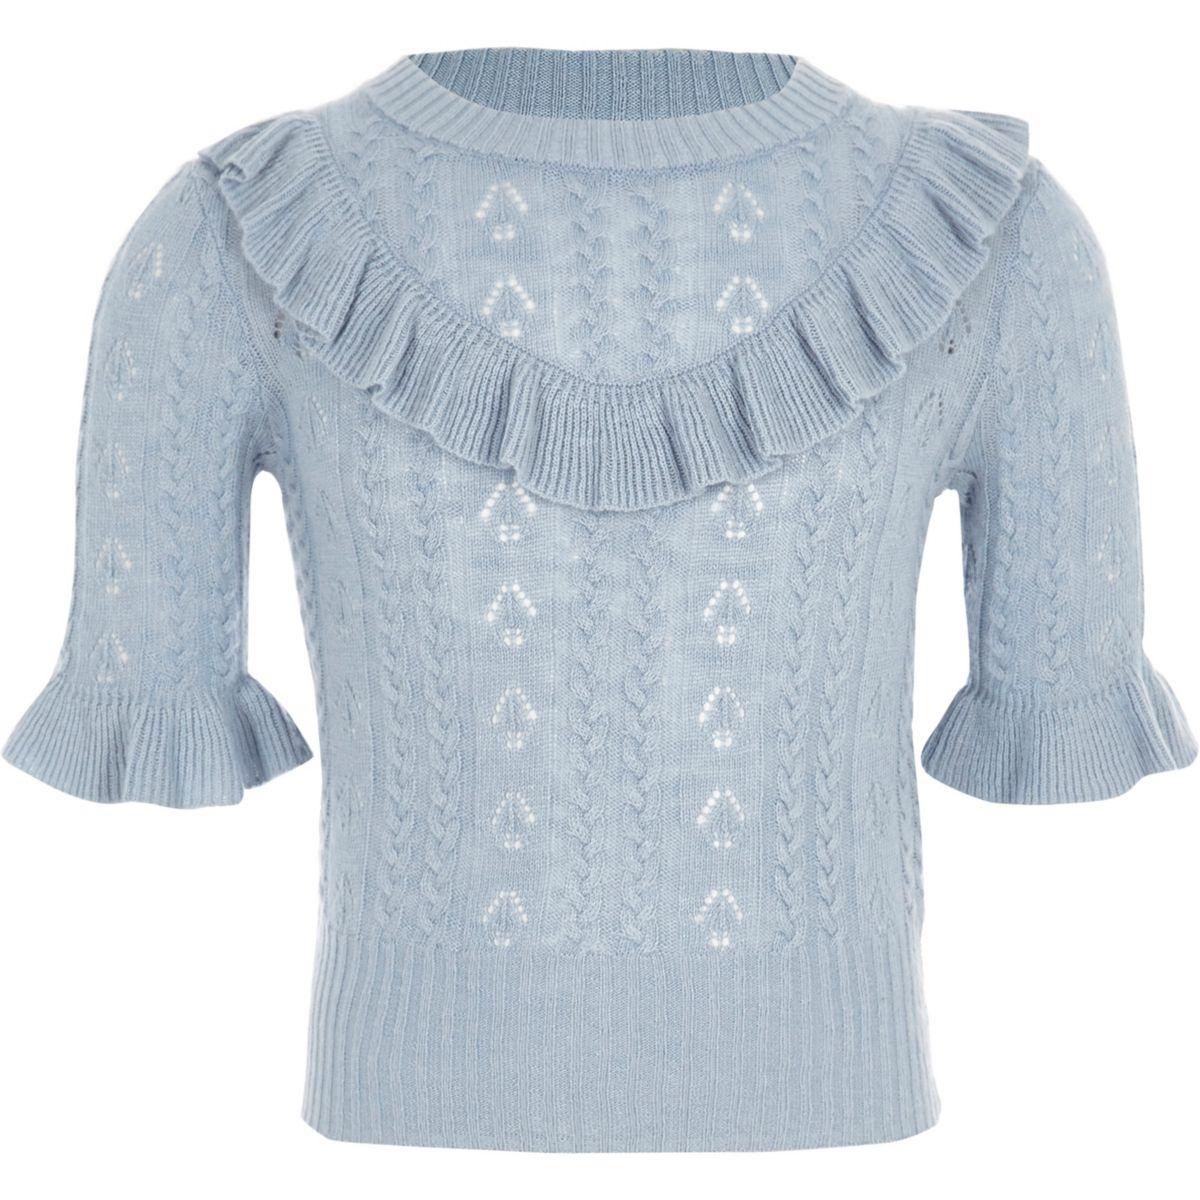 Girls light blue frill pointelle knit sweater